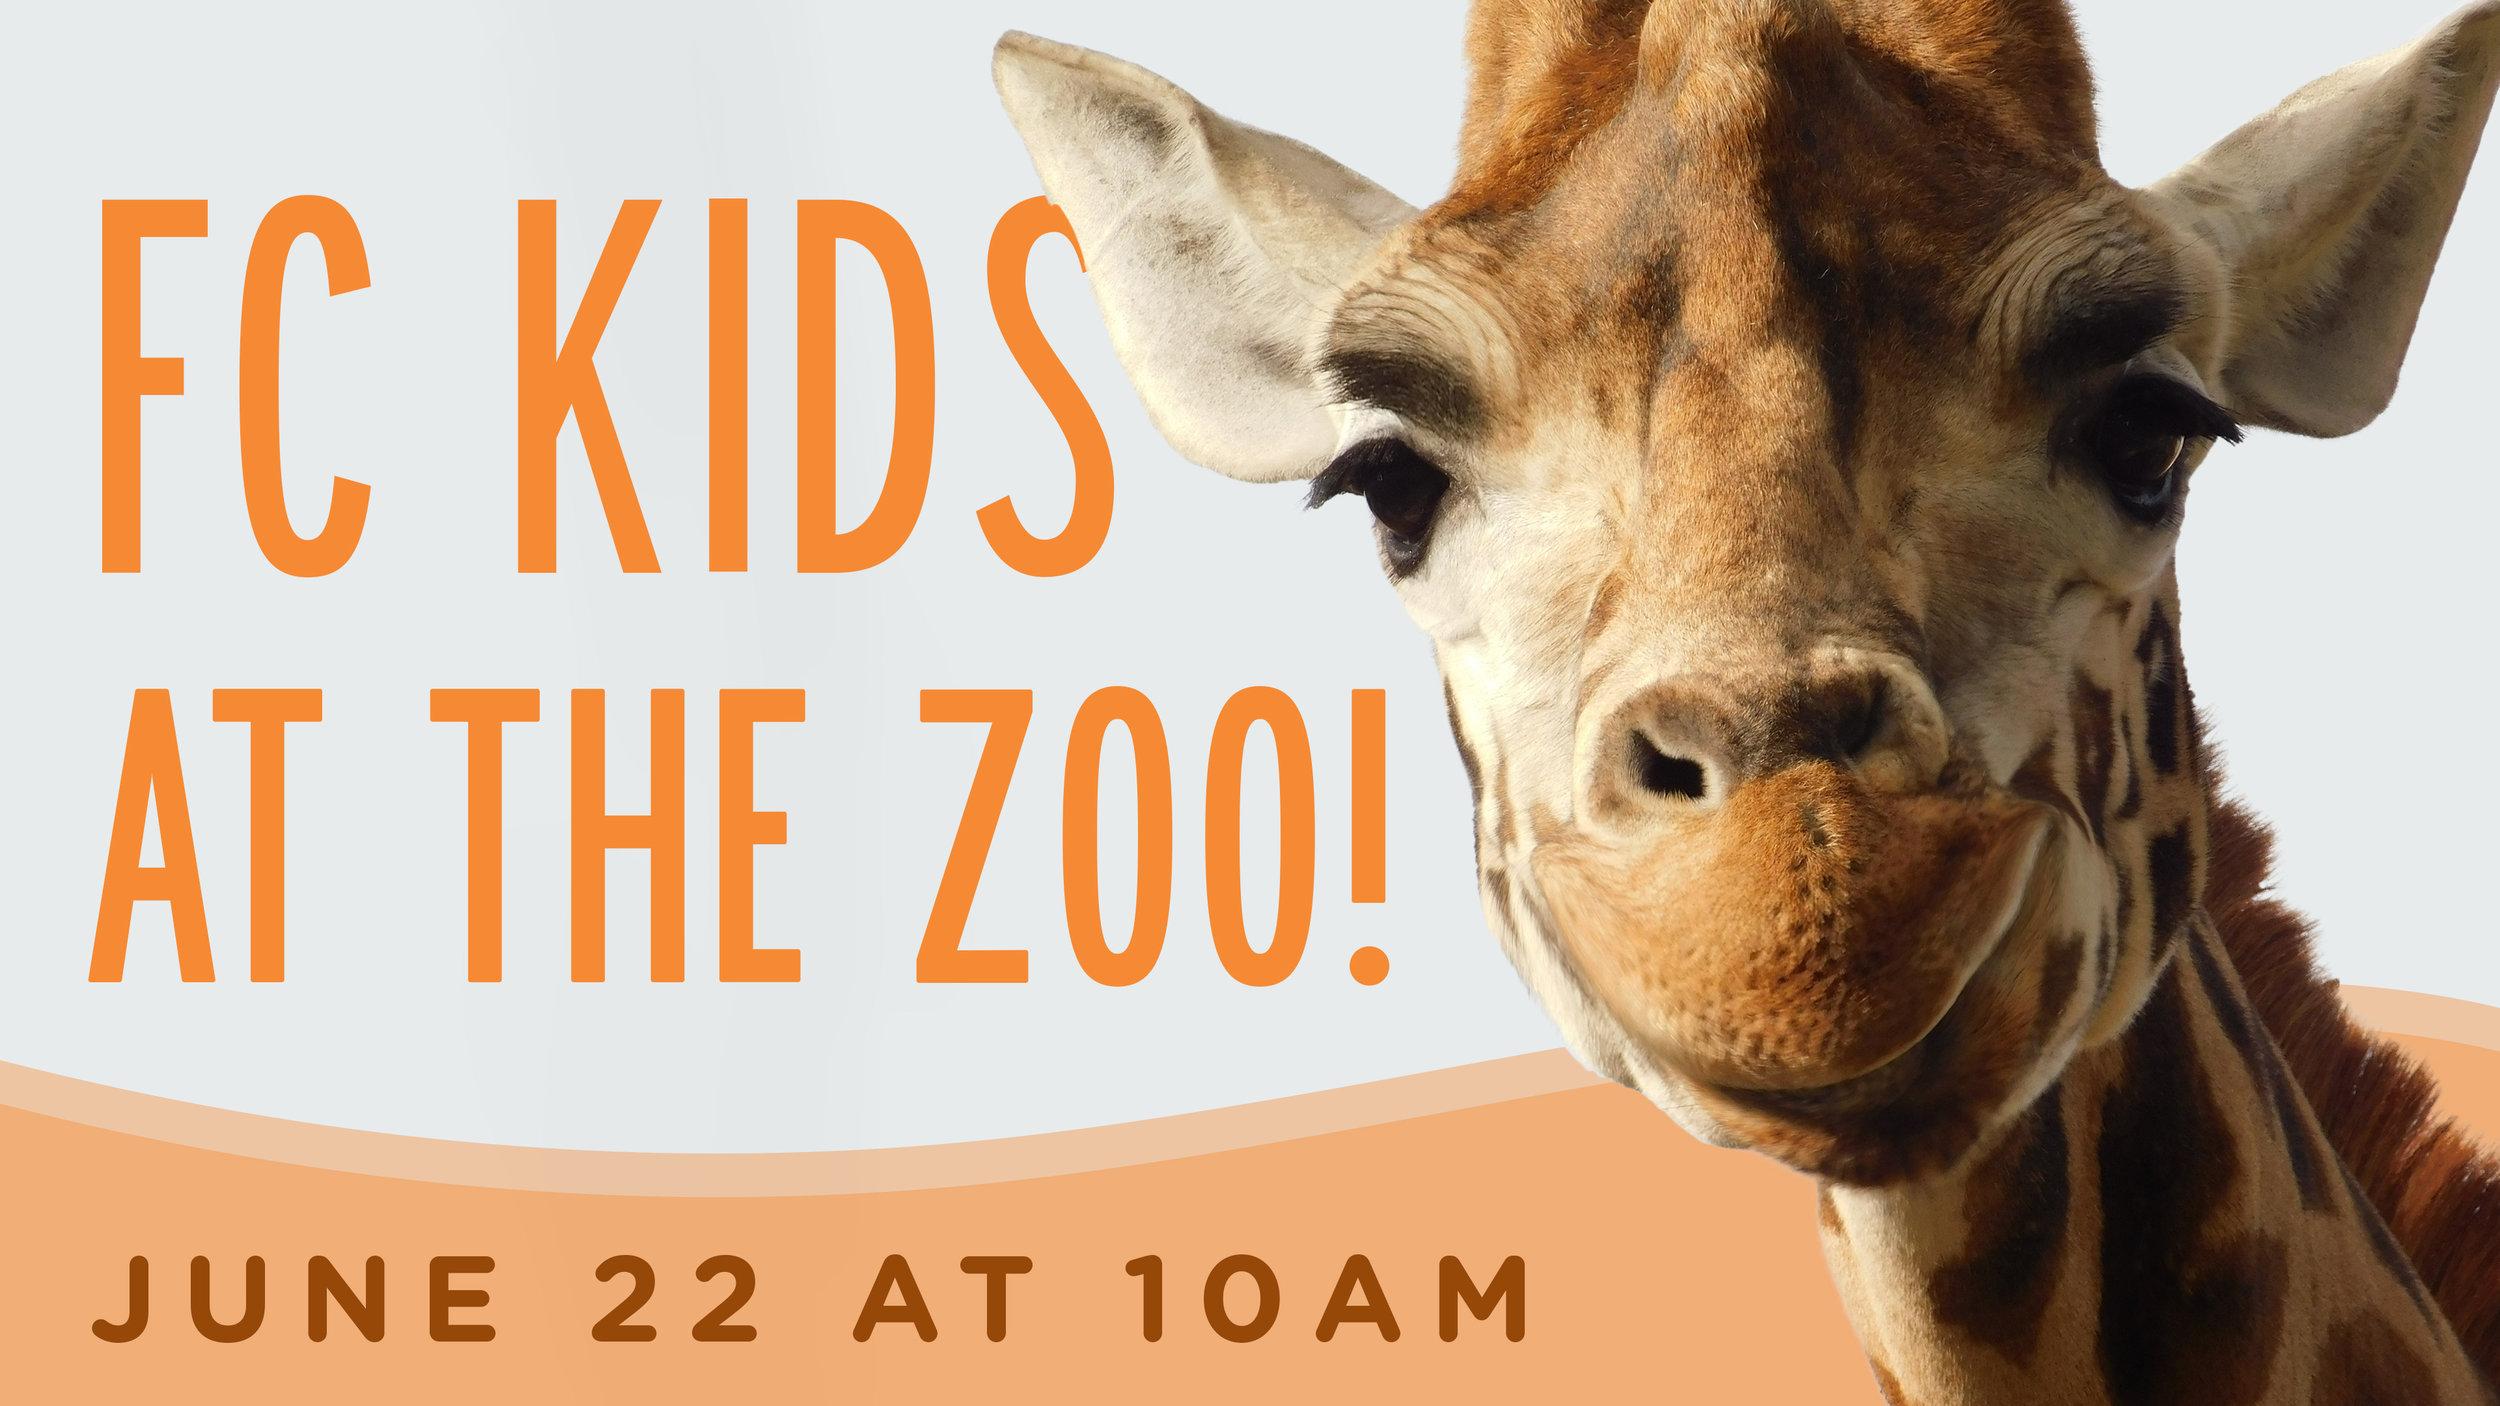 fc kids at the zoo.jpg